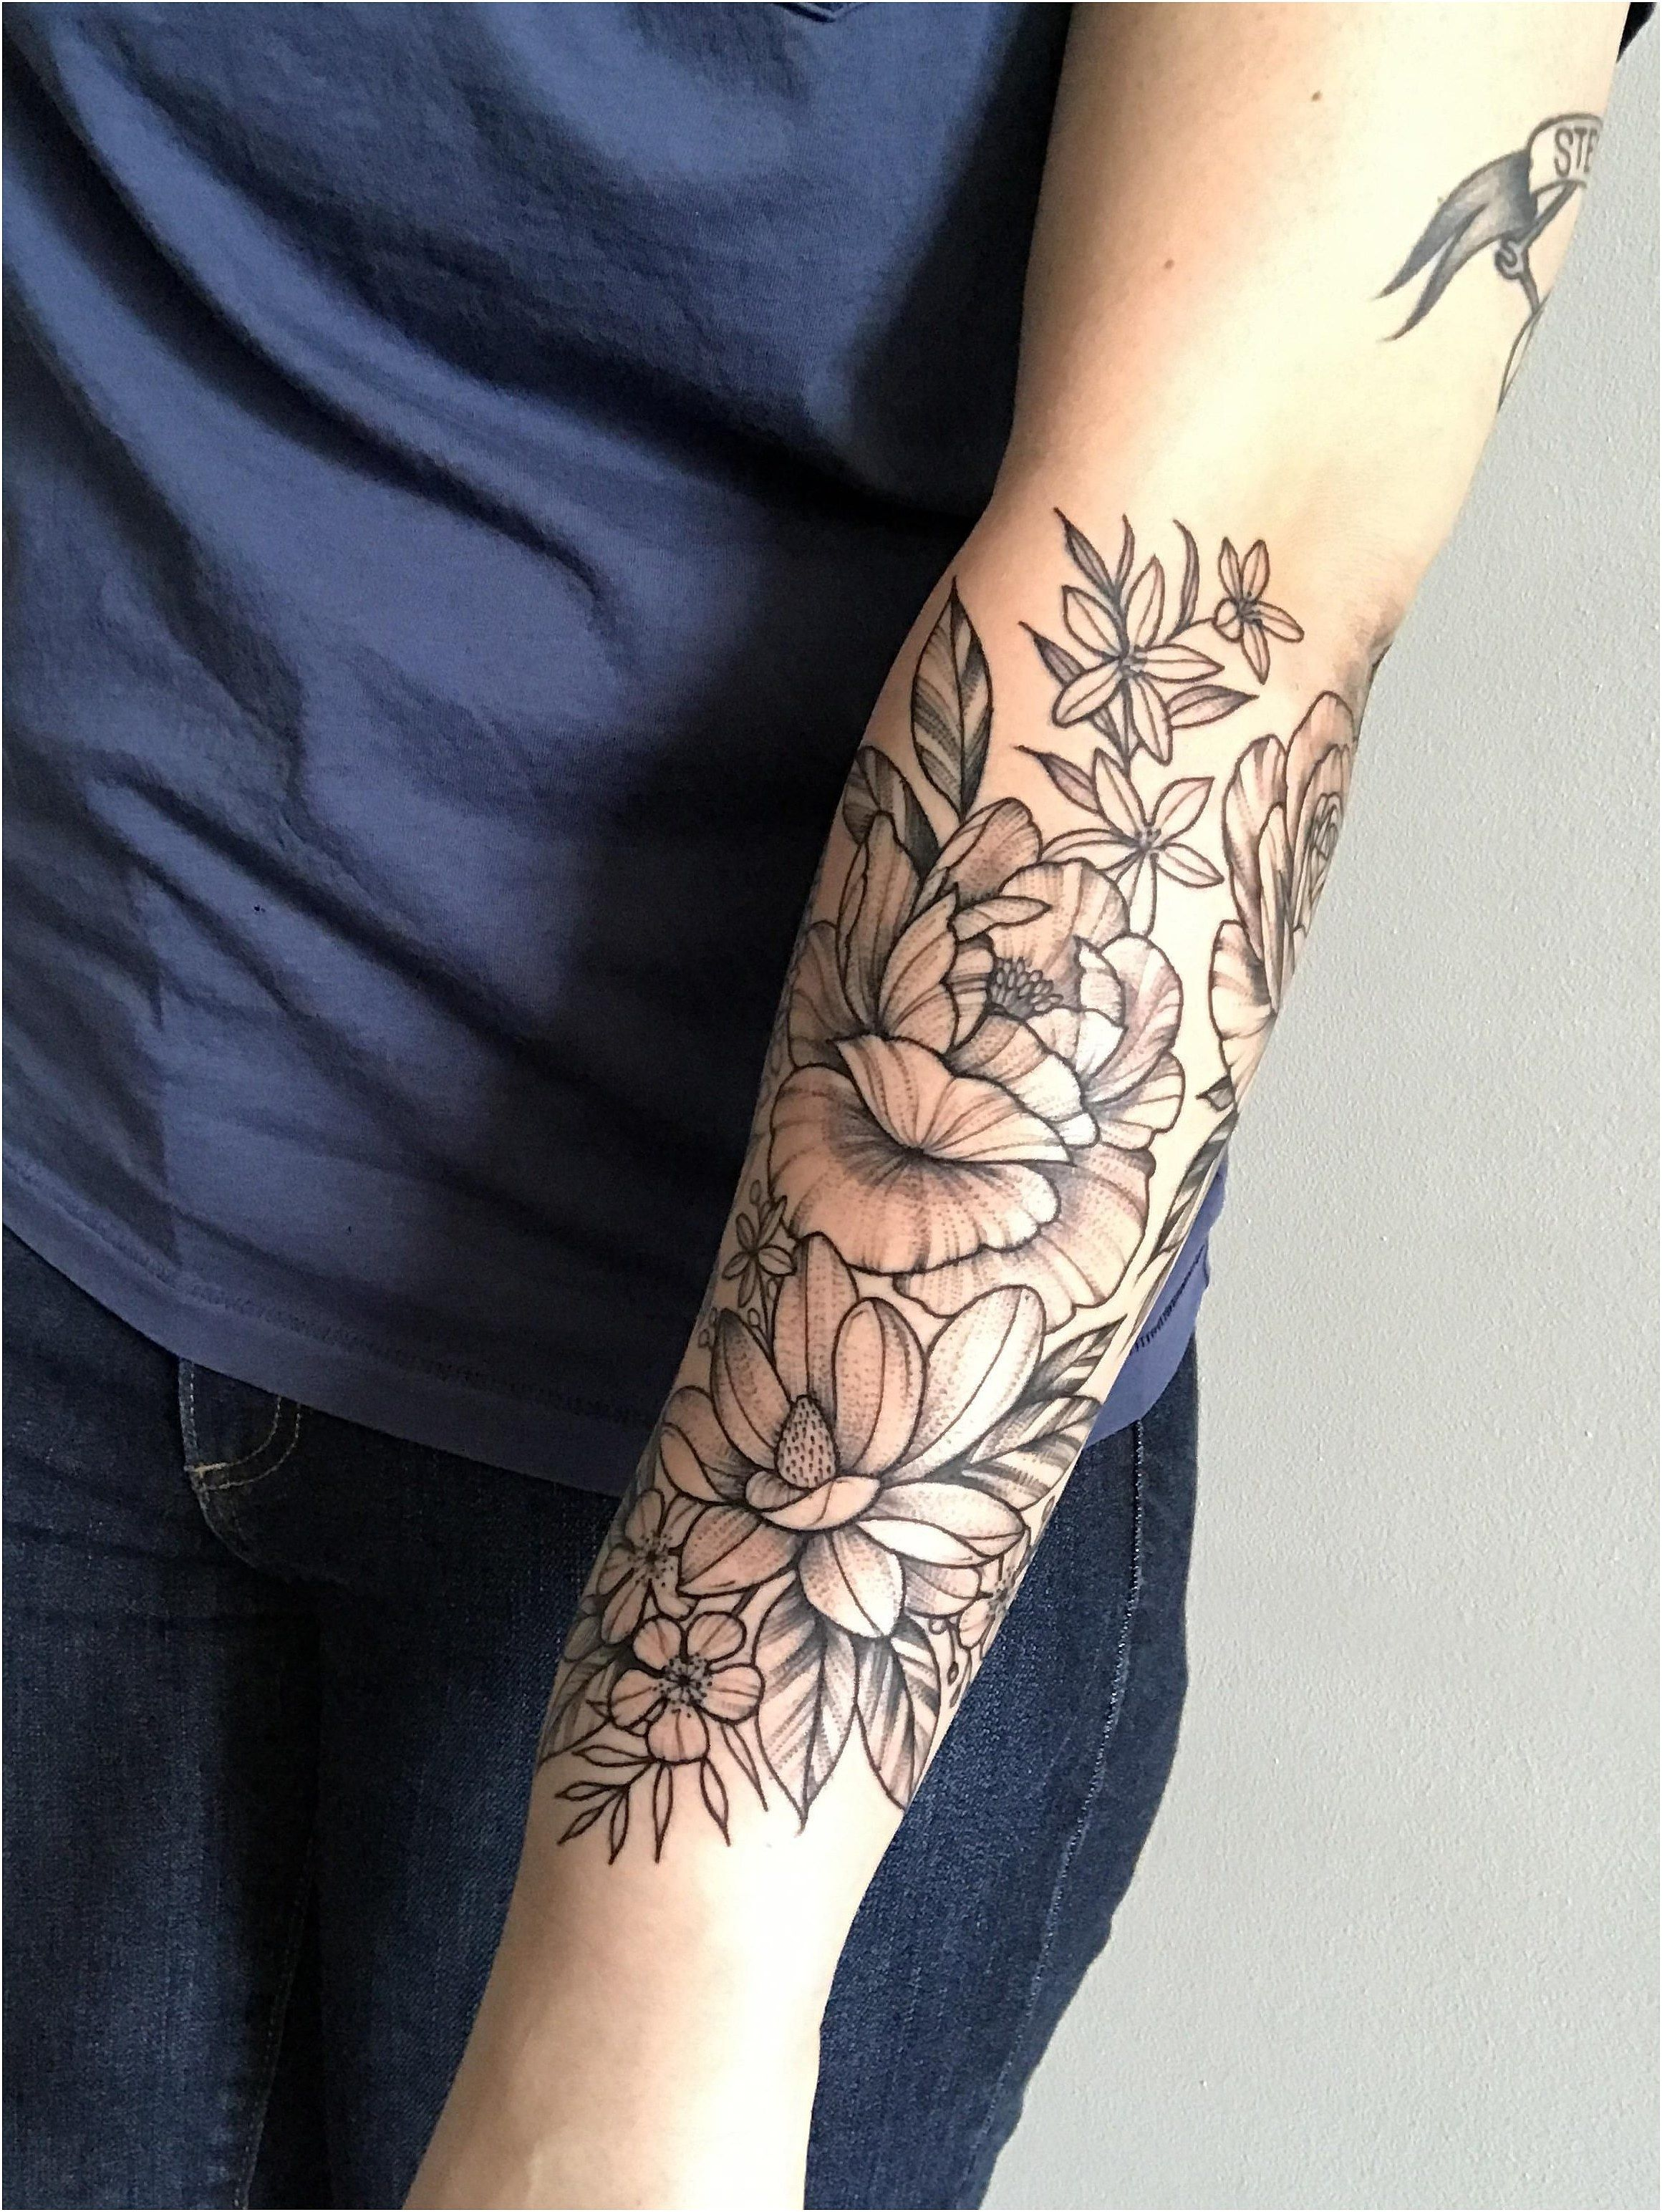 Tattoo Simple Symbols Bird Tattoo Neck Tattoo And Its Meaning Tattoo Flash Prints Chinese Symbo Half Sleeve Tattoo Girls With Sleeve Tattoos Sleeve Tattoos